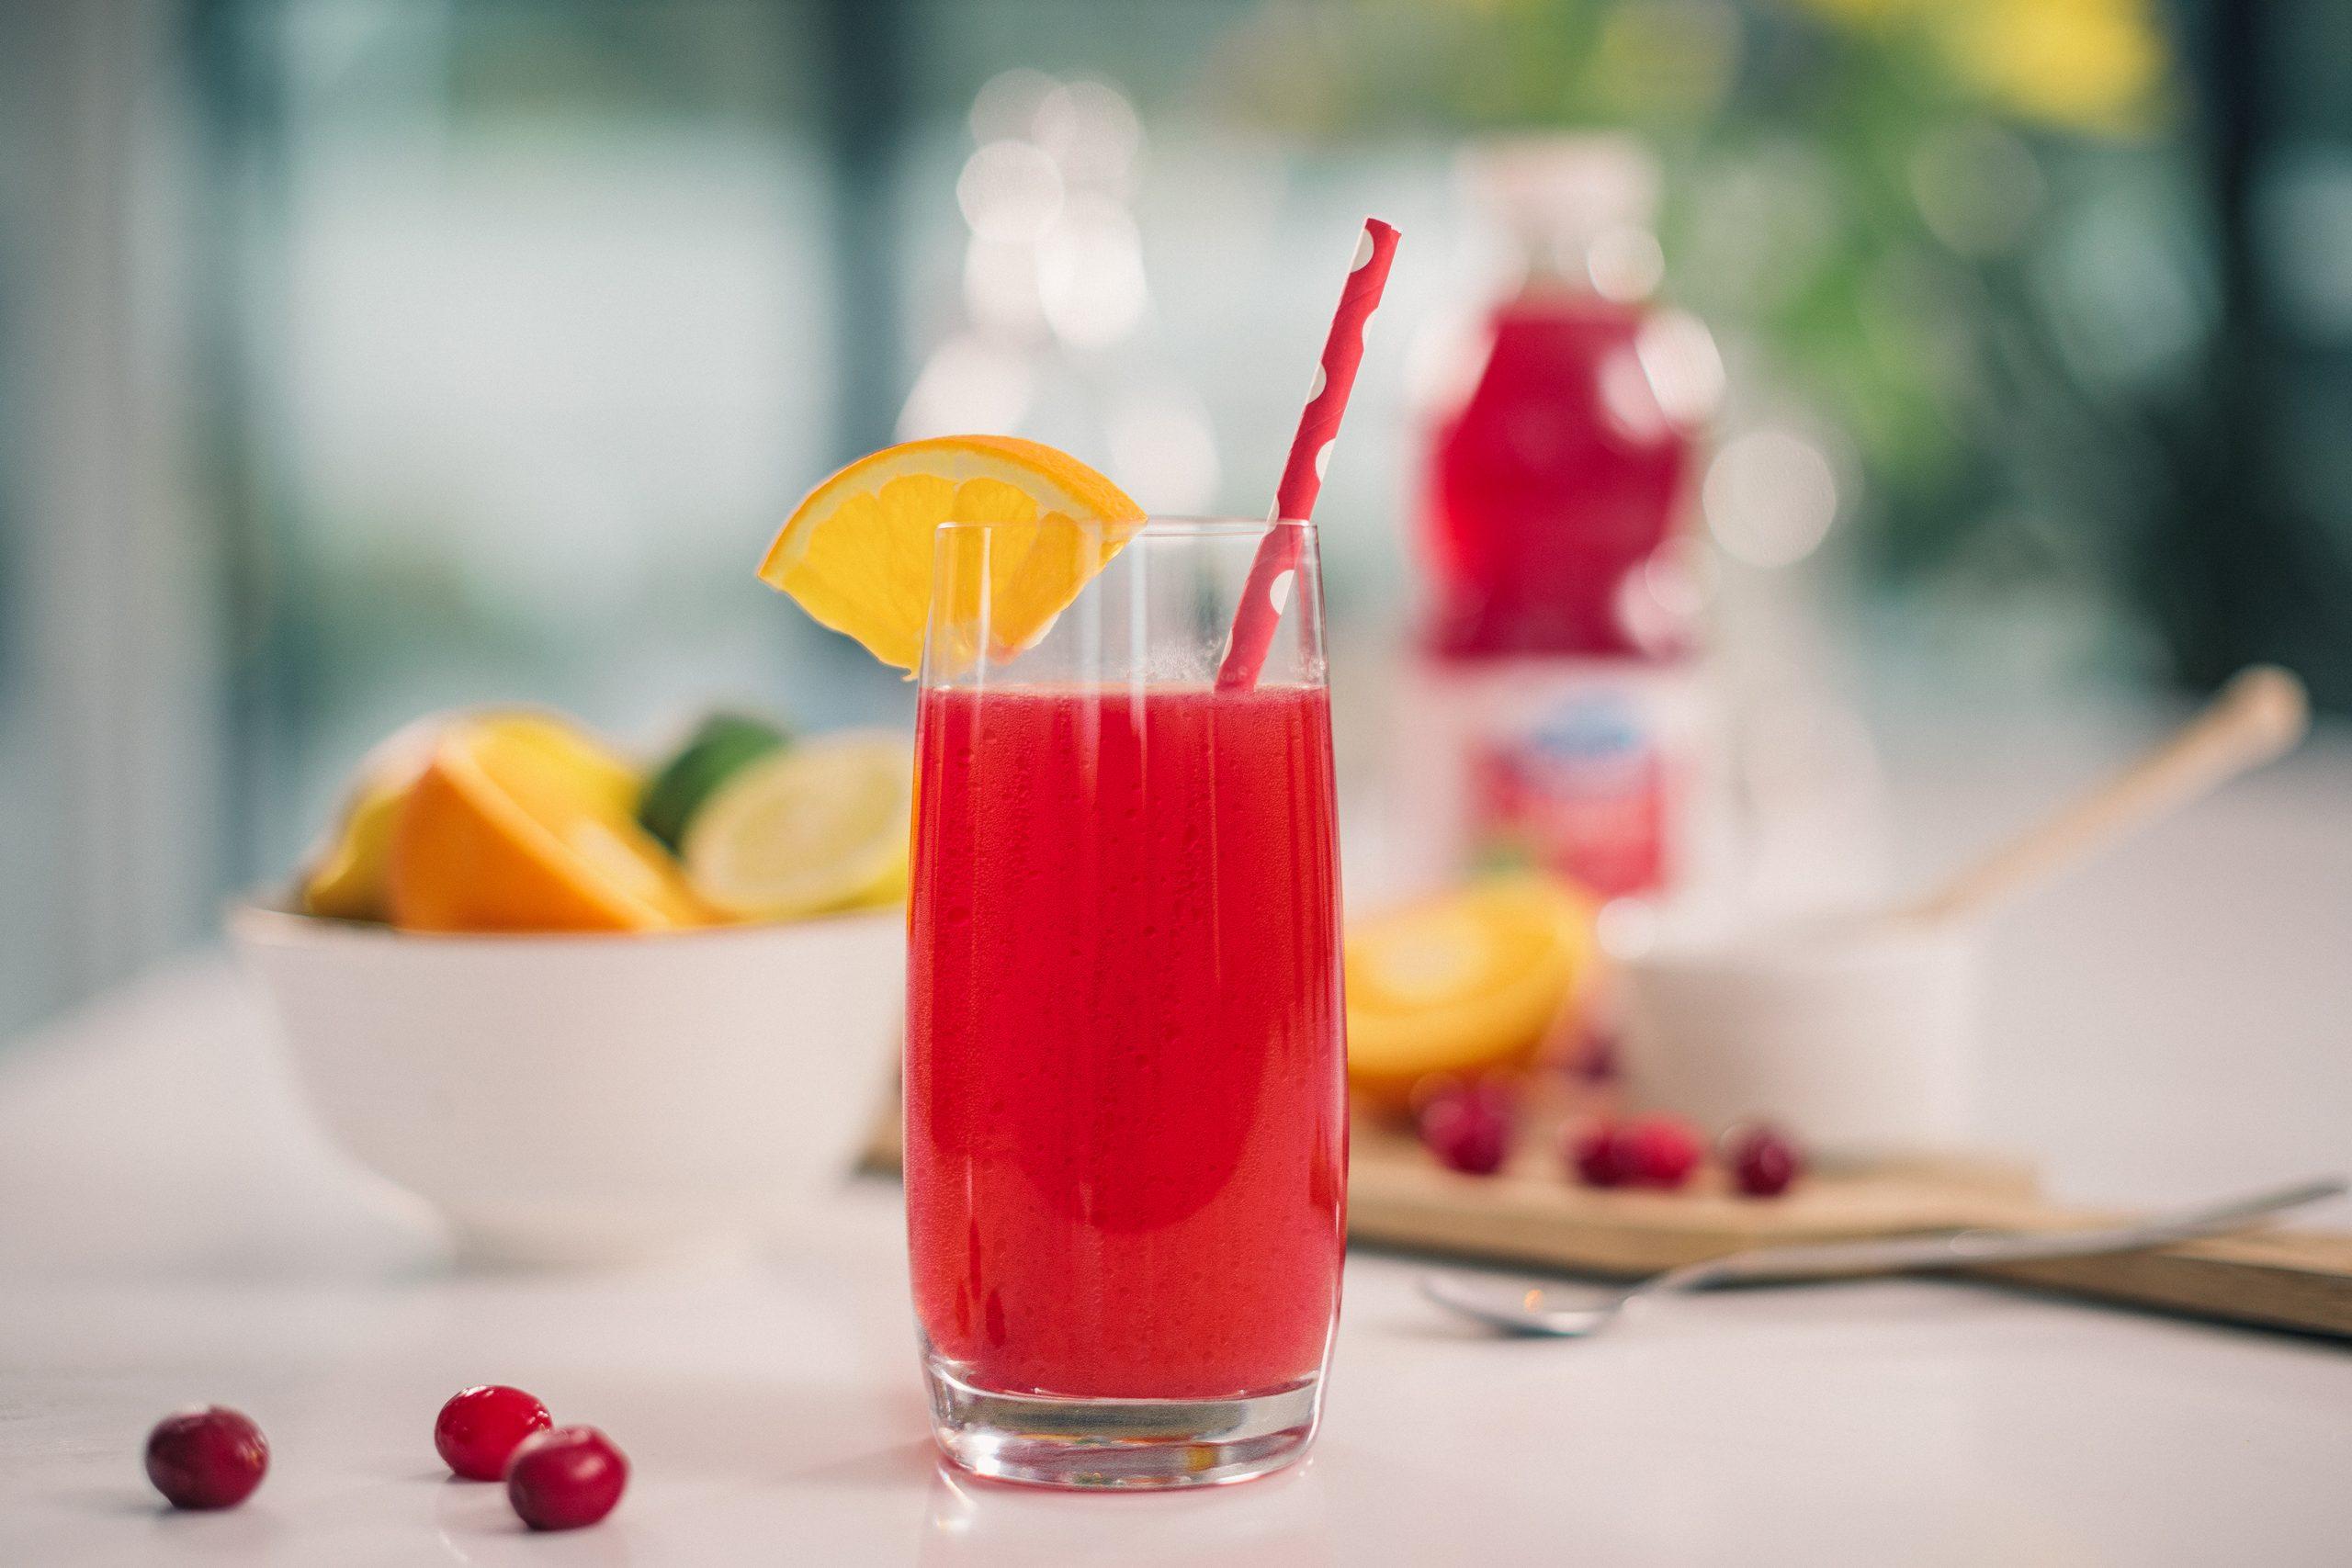 Cranberry, lemon and orange with honey